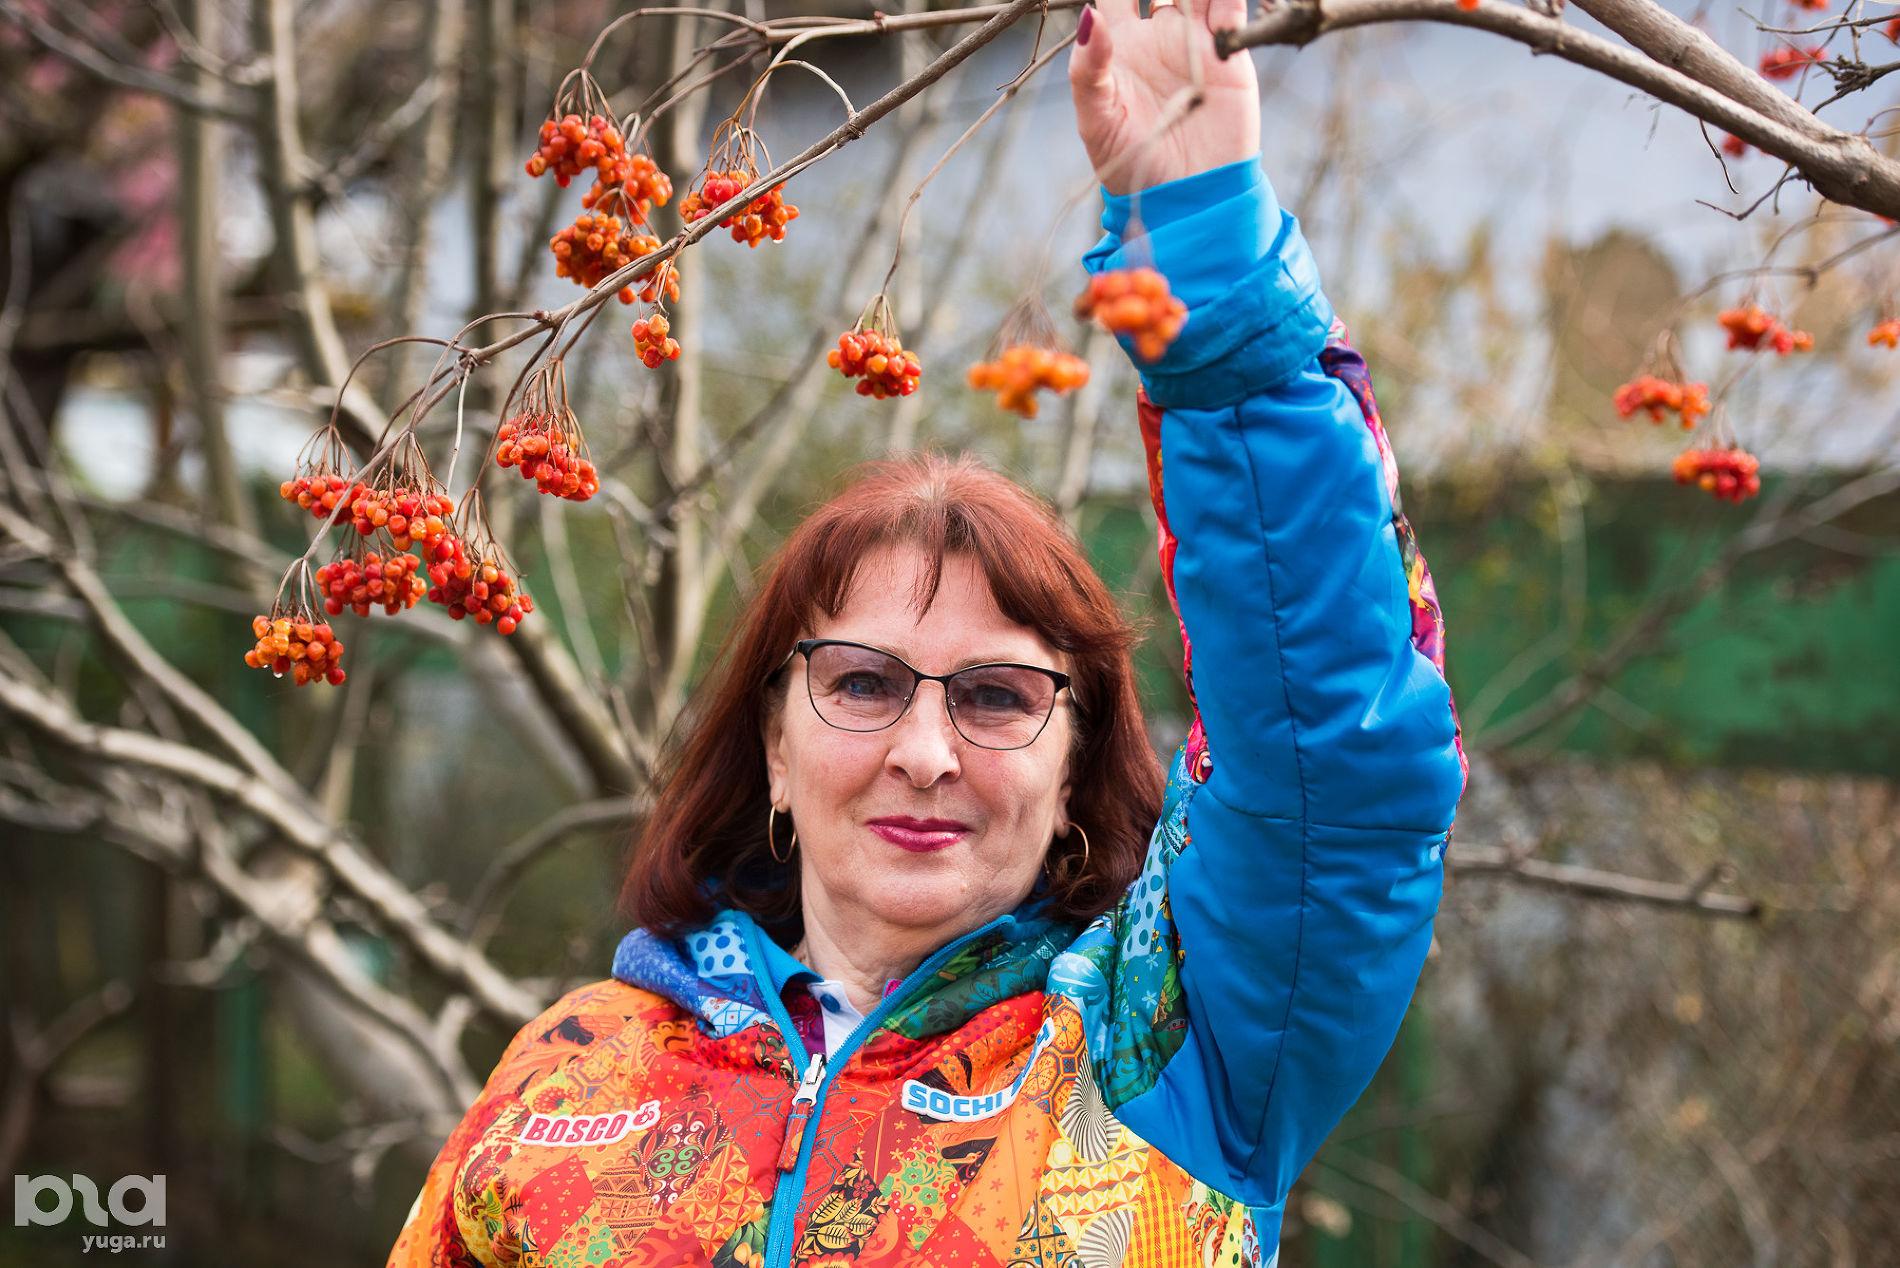 Волонтер Ирина Ермолаева